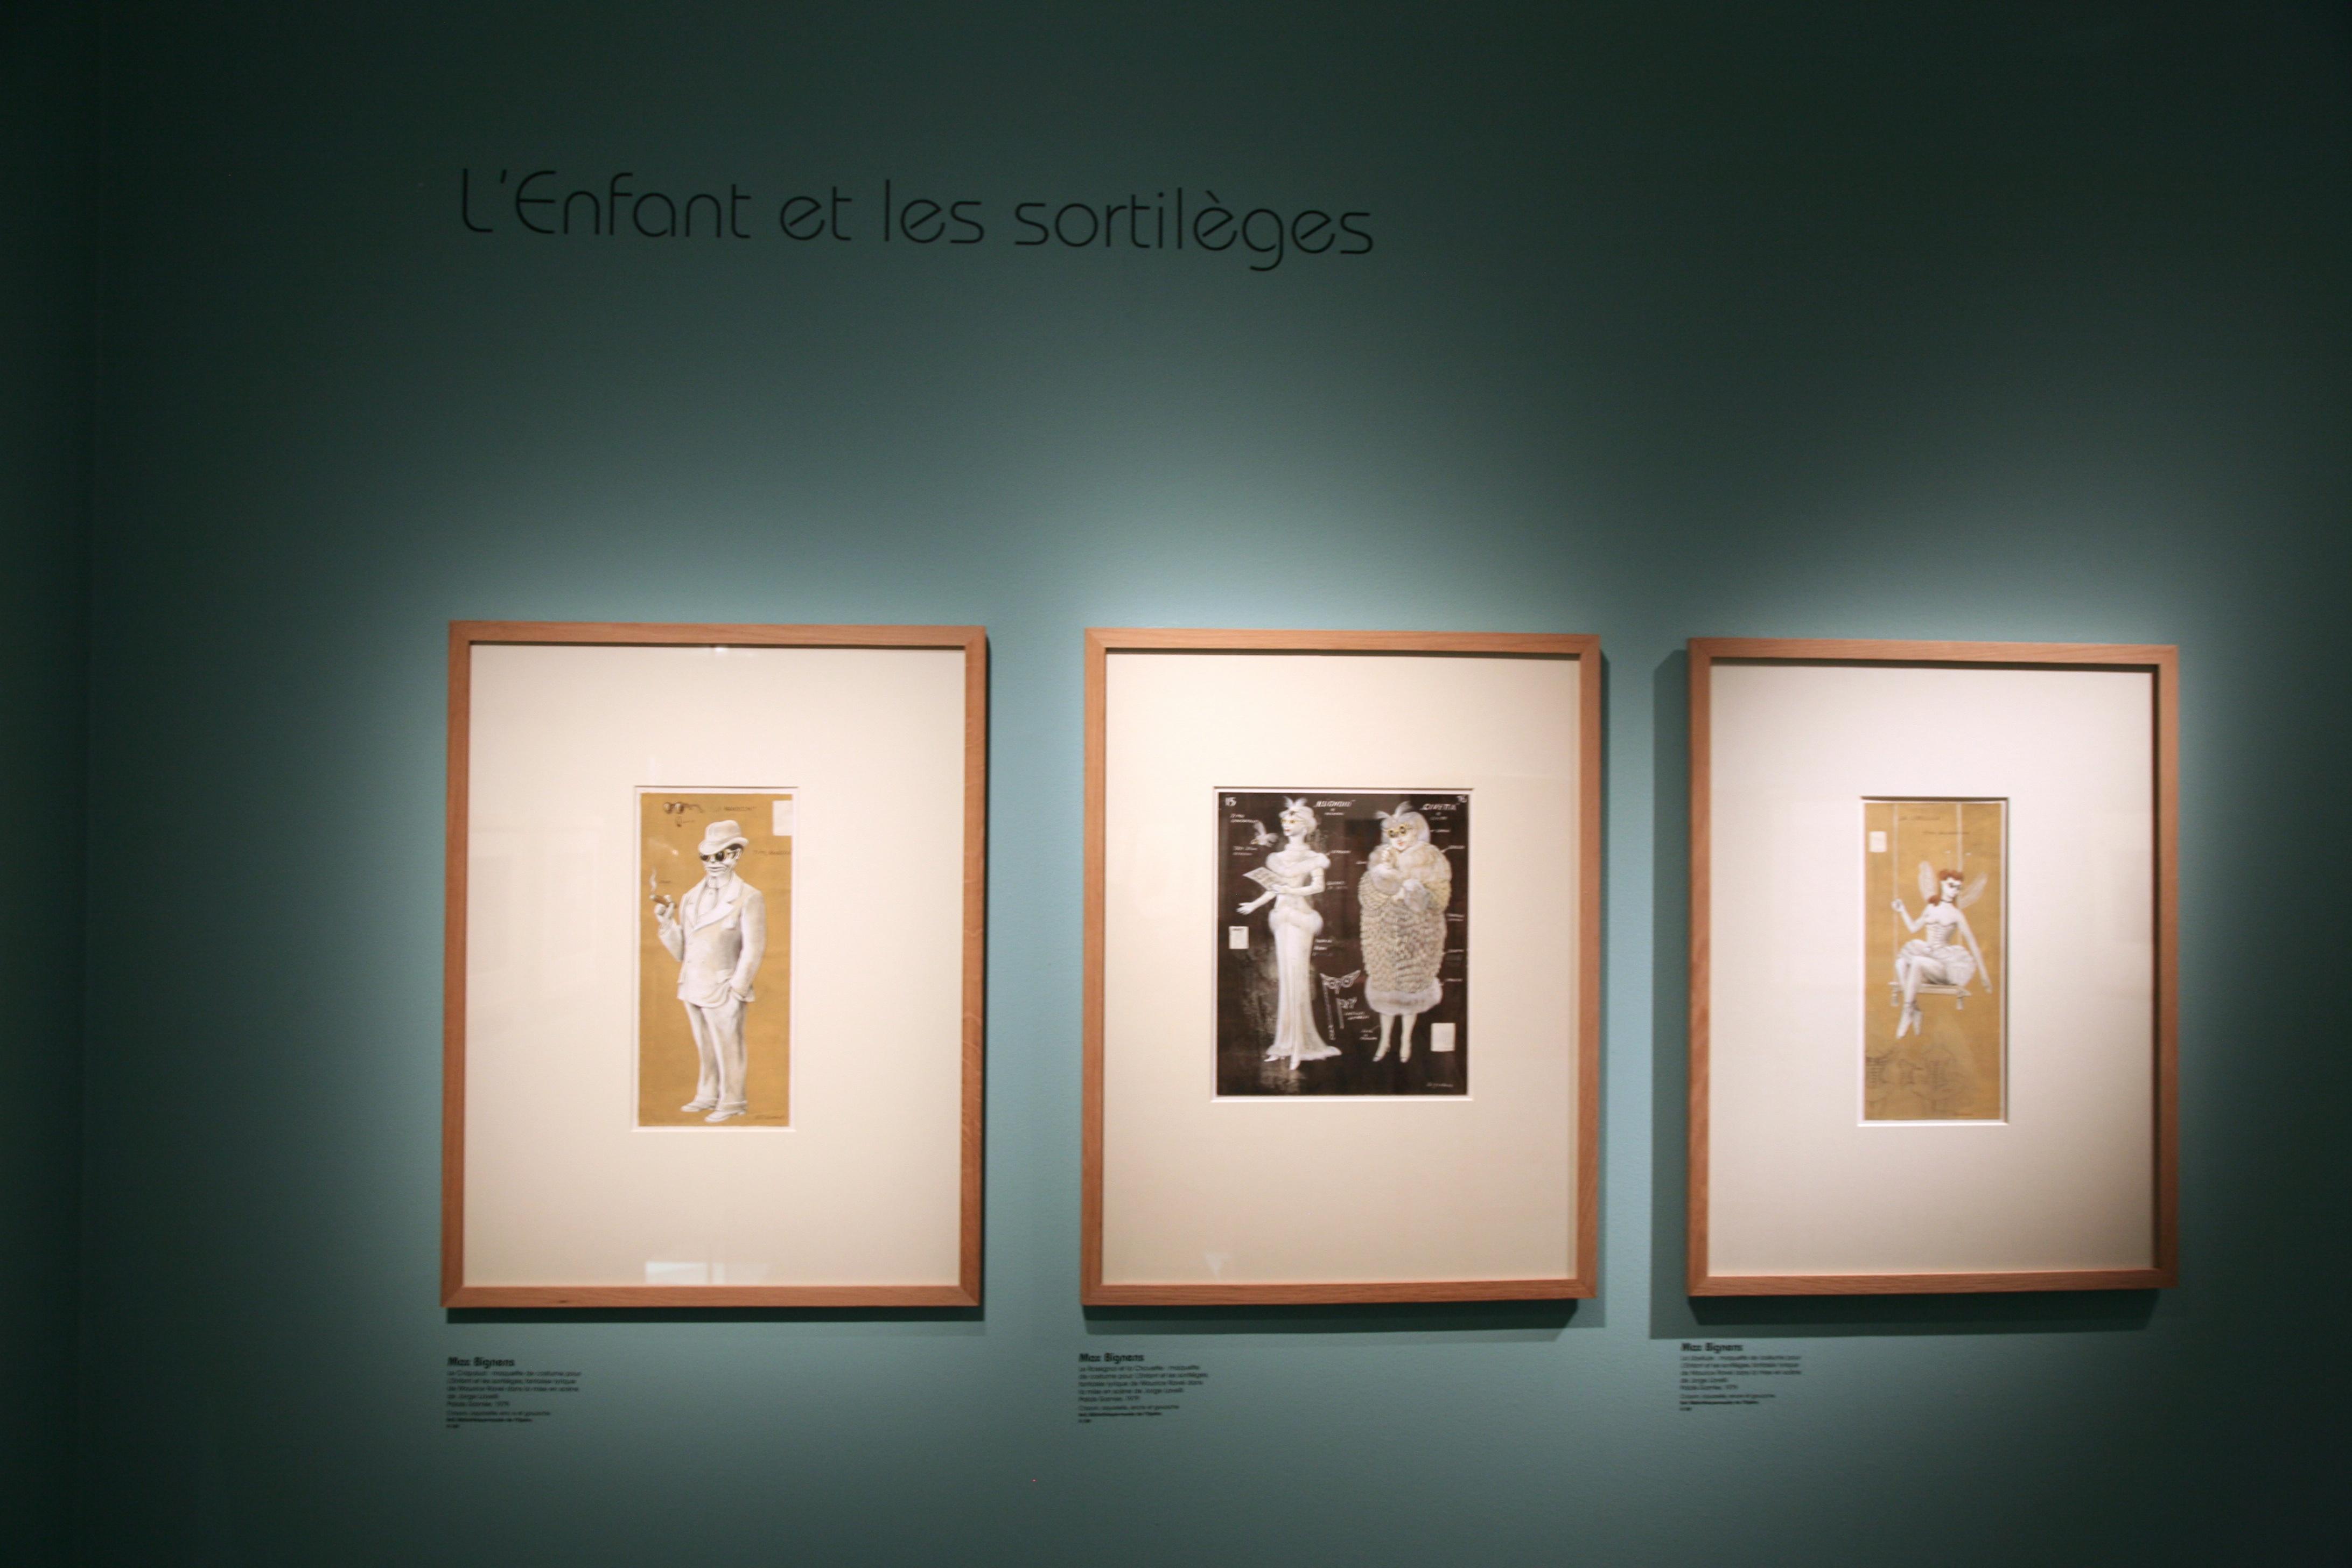 Kostenlose foto : Paris, Oper, Malerei, Marke, Exposition, Entwurf ...